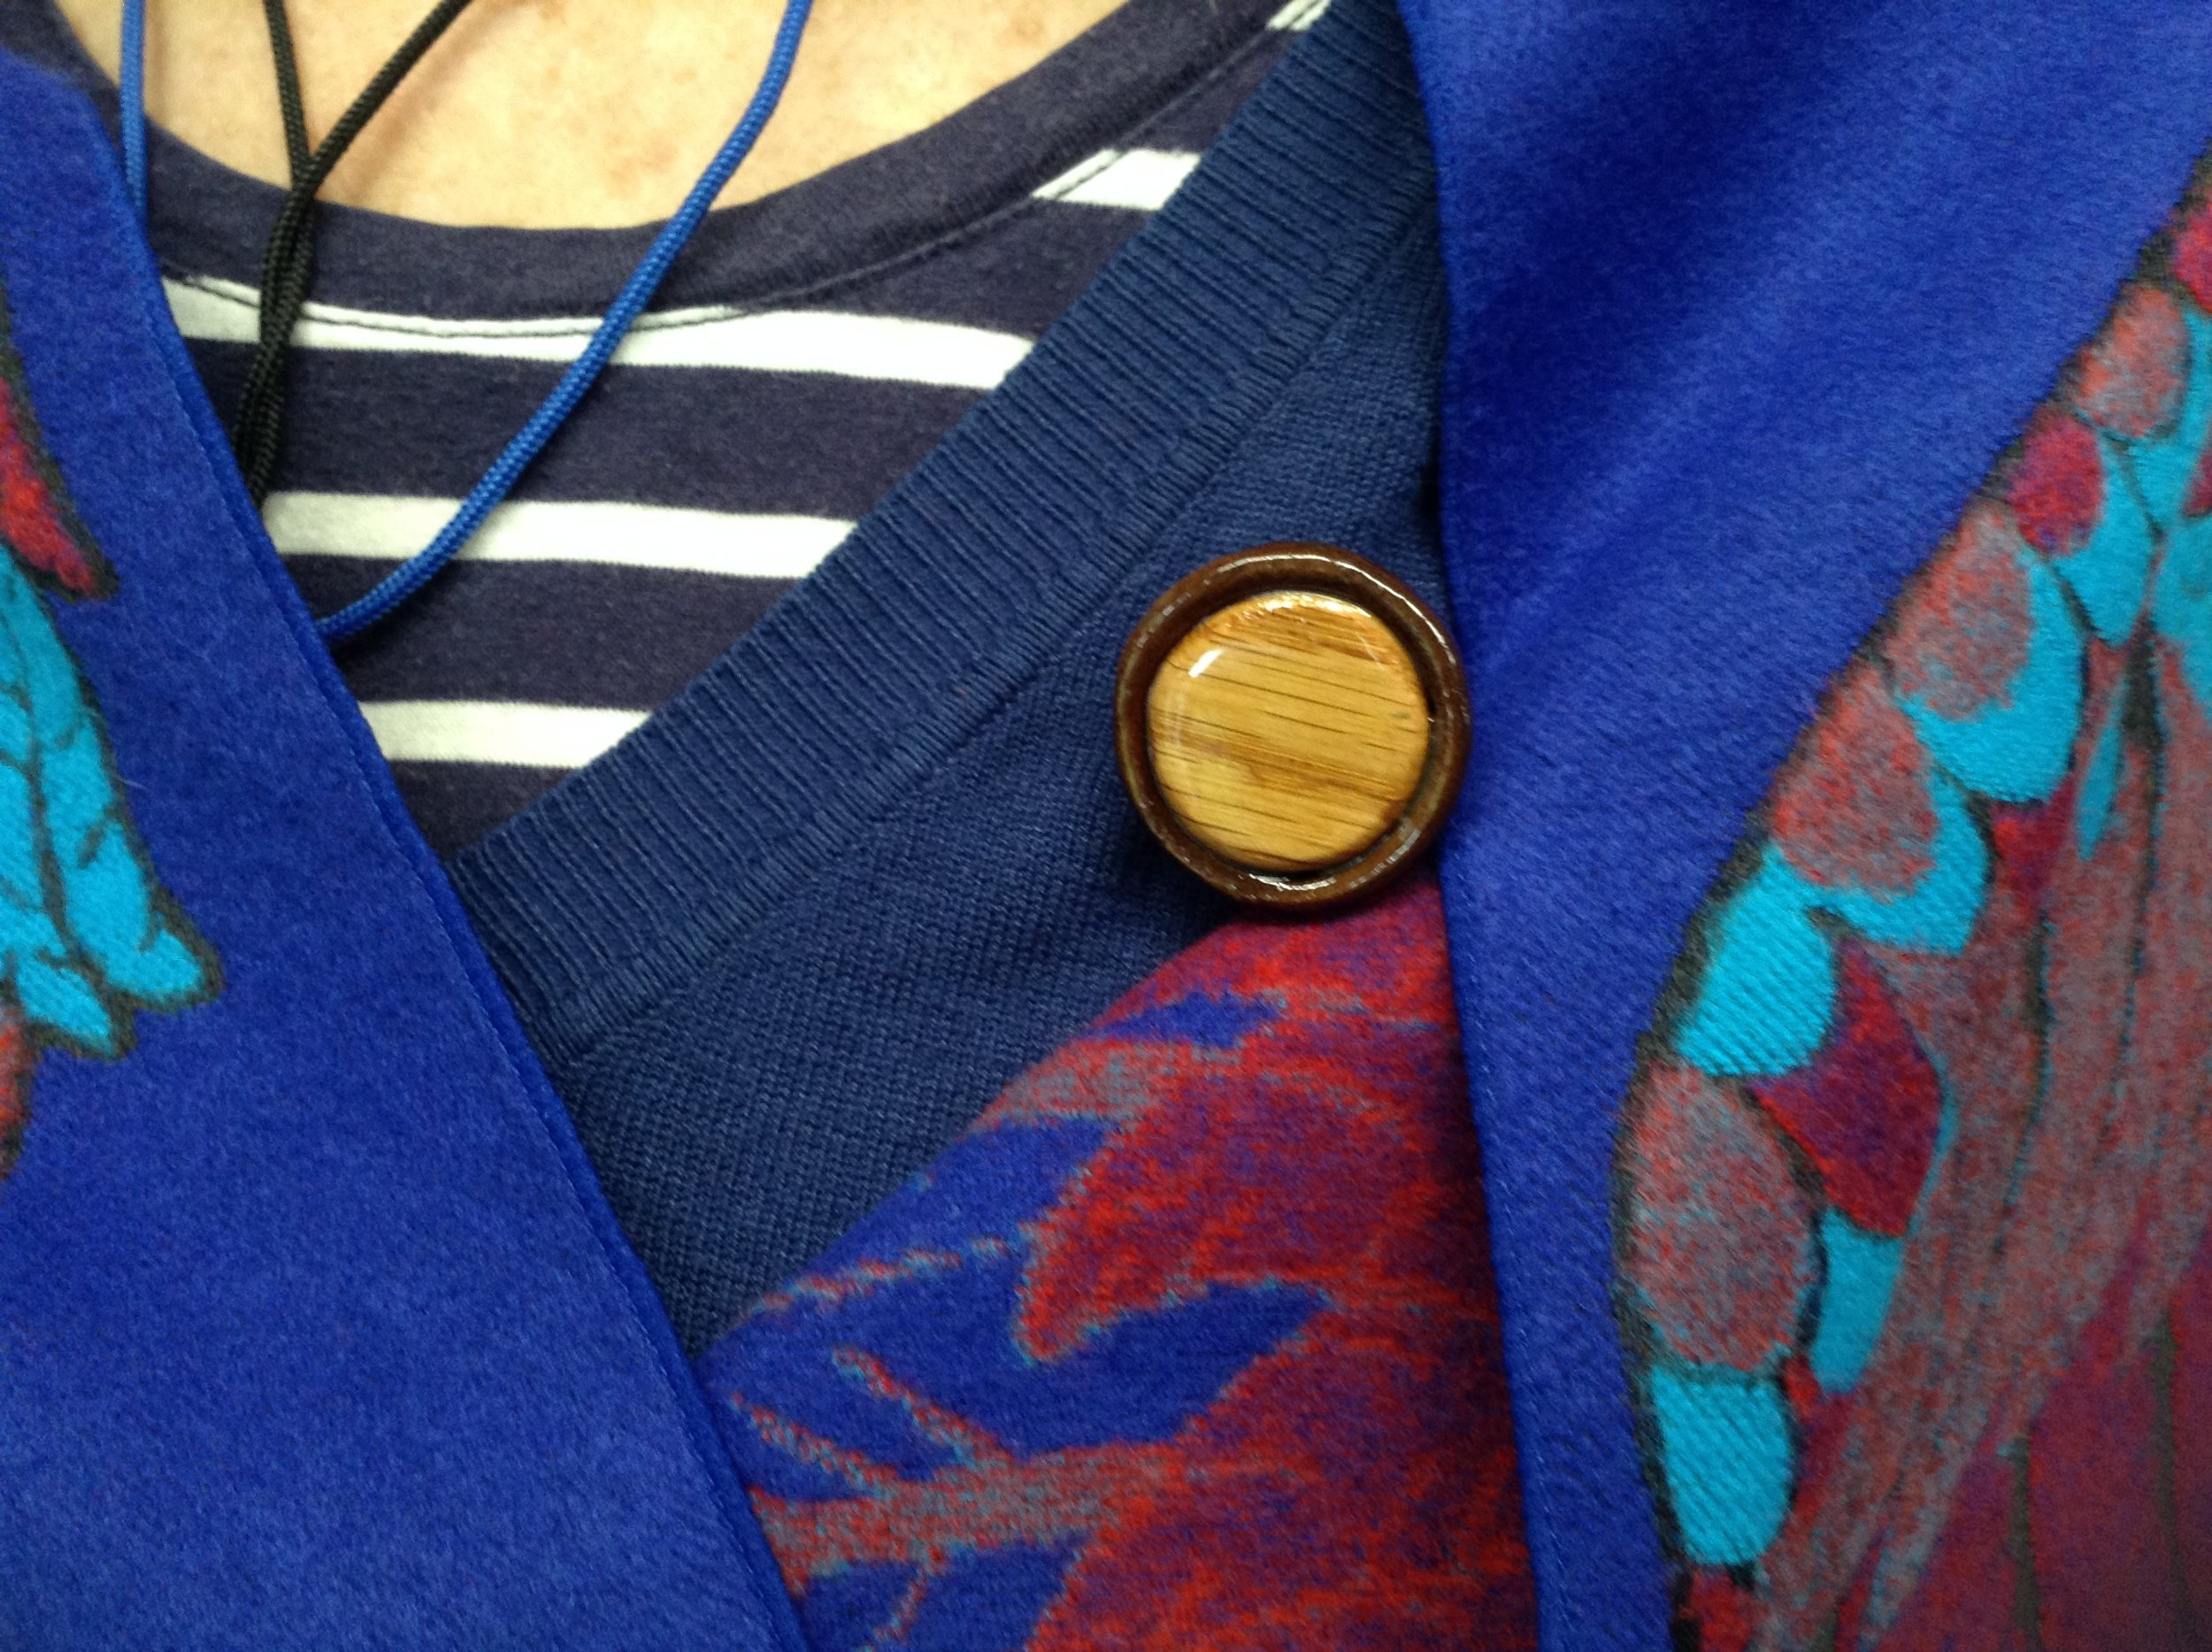 Handmade tar pins